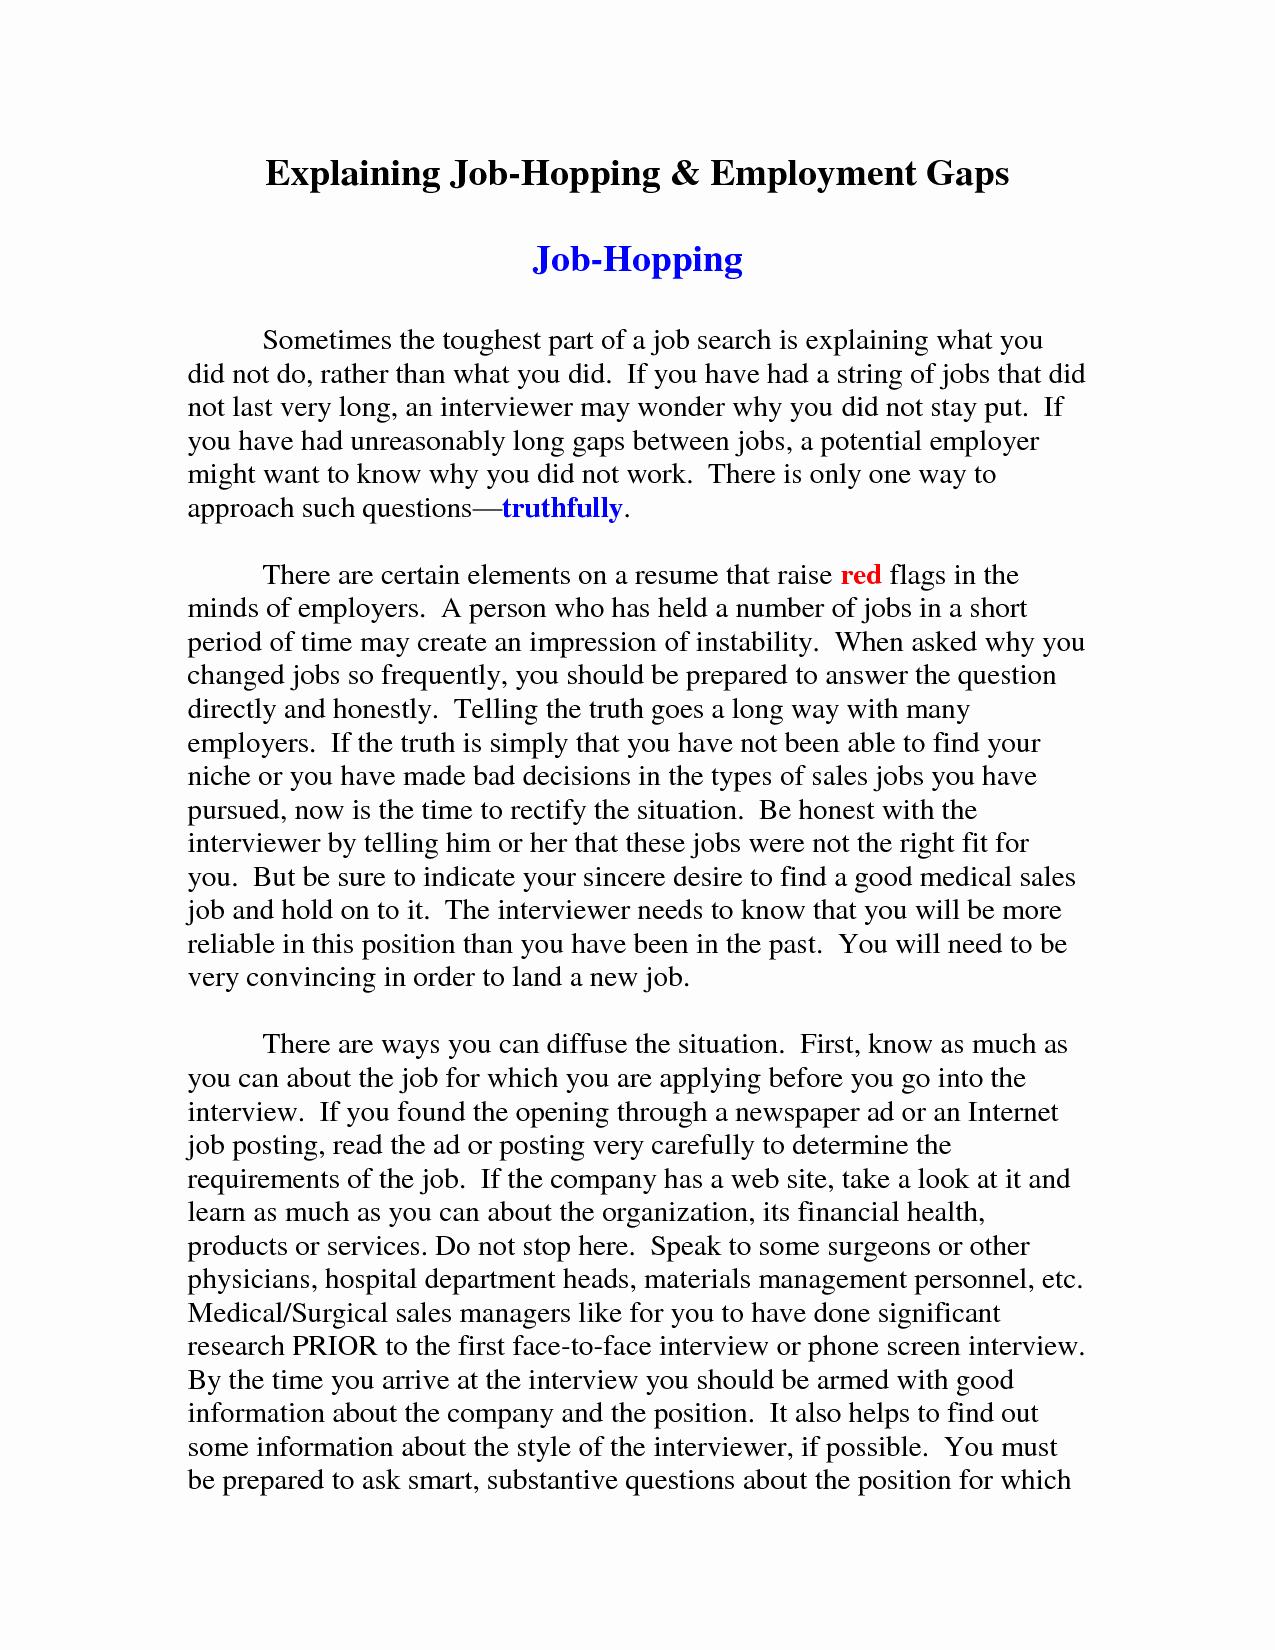 Sample Resume Employment Gaps